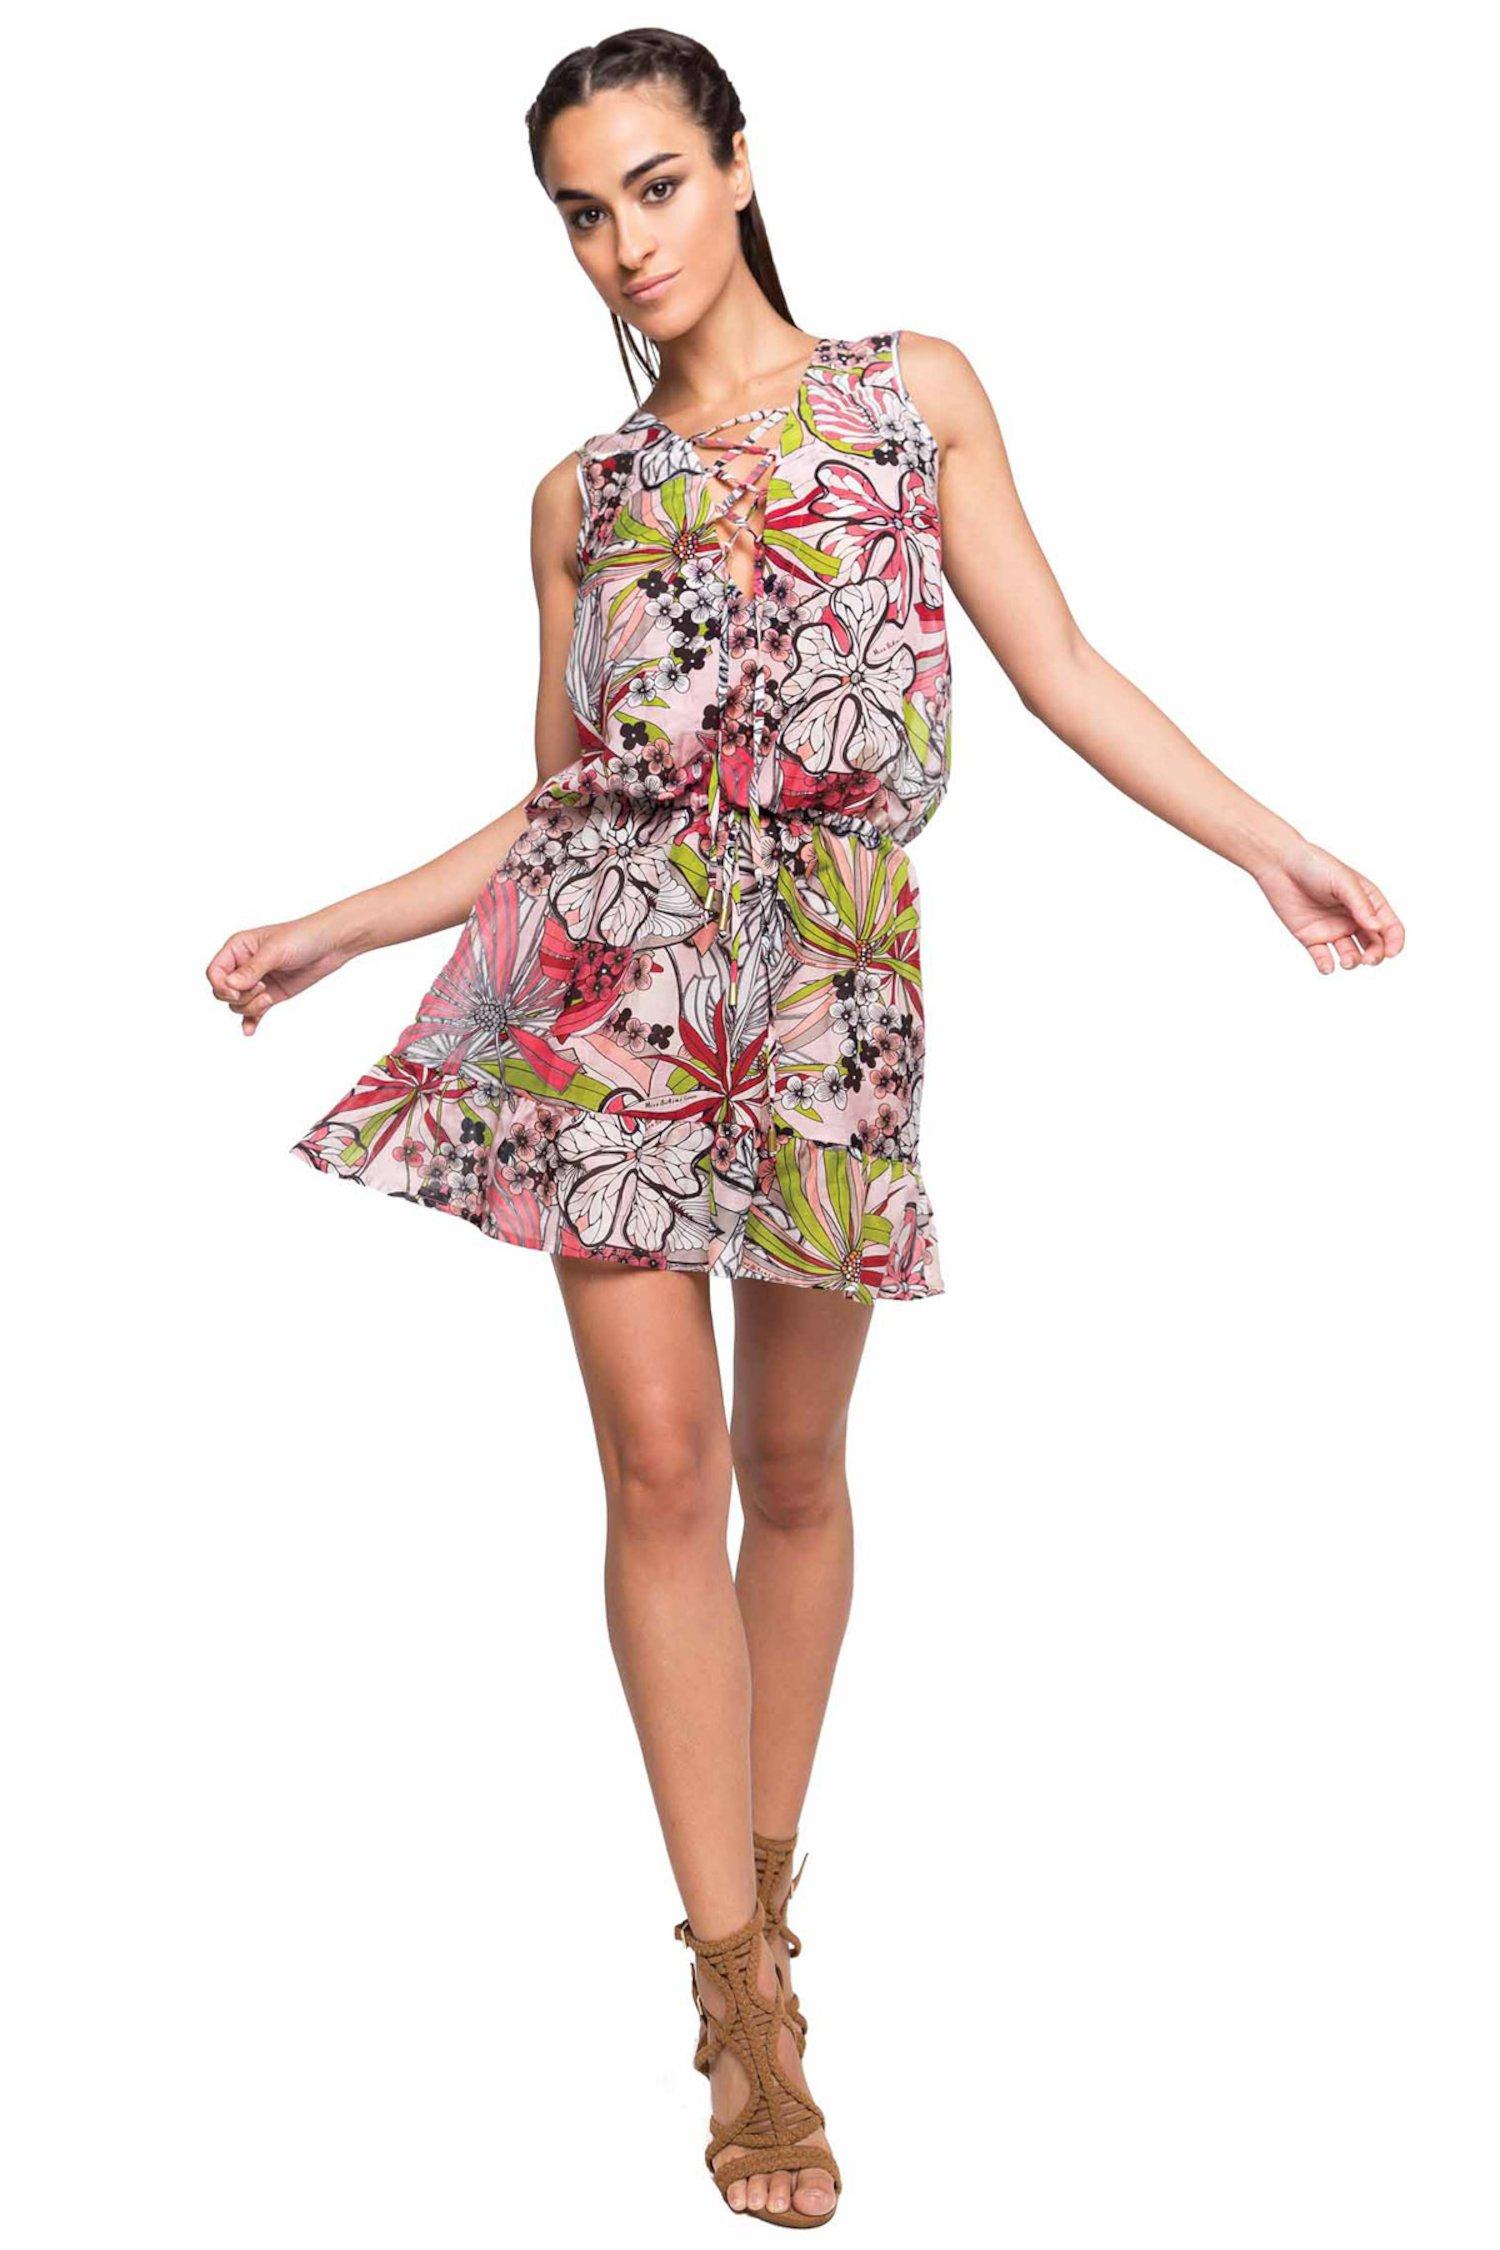 SHORT DRESS FRILLS STRINGED NECK - Fiori Rosa